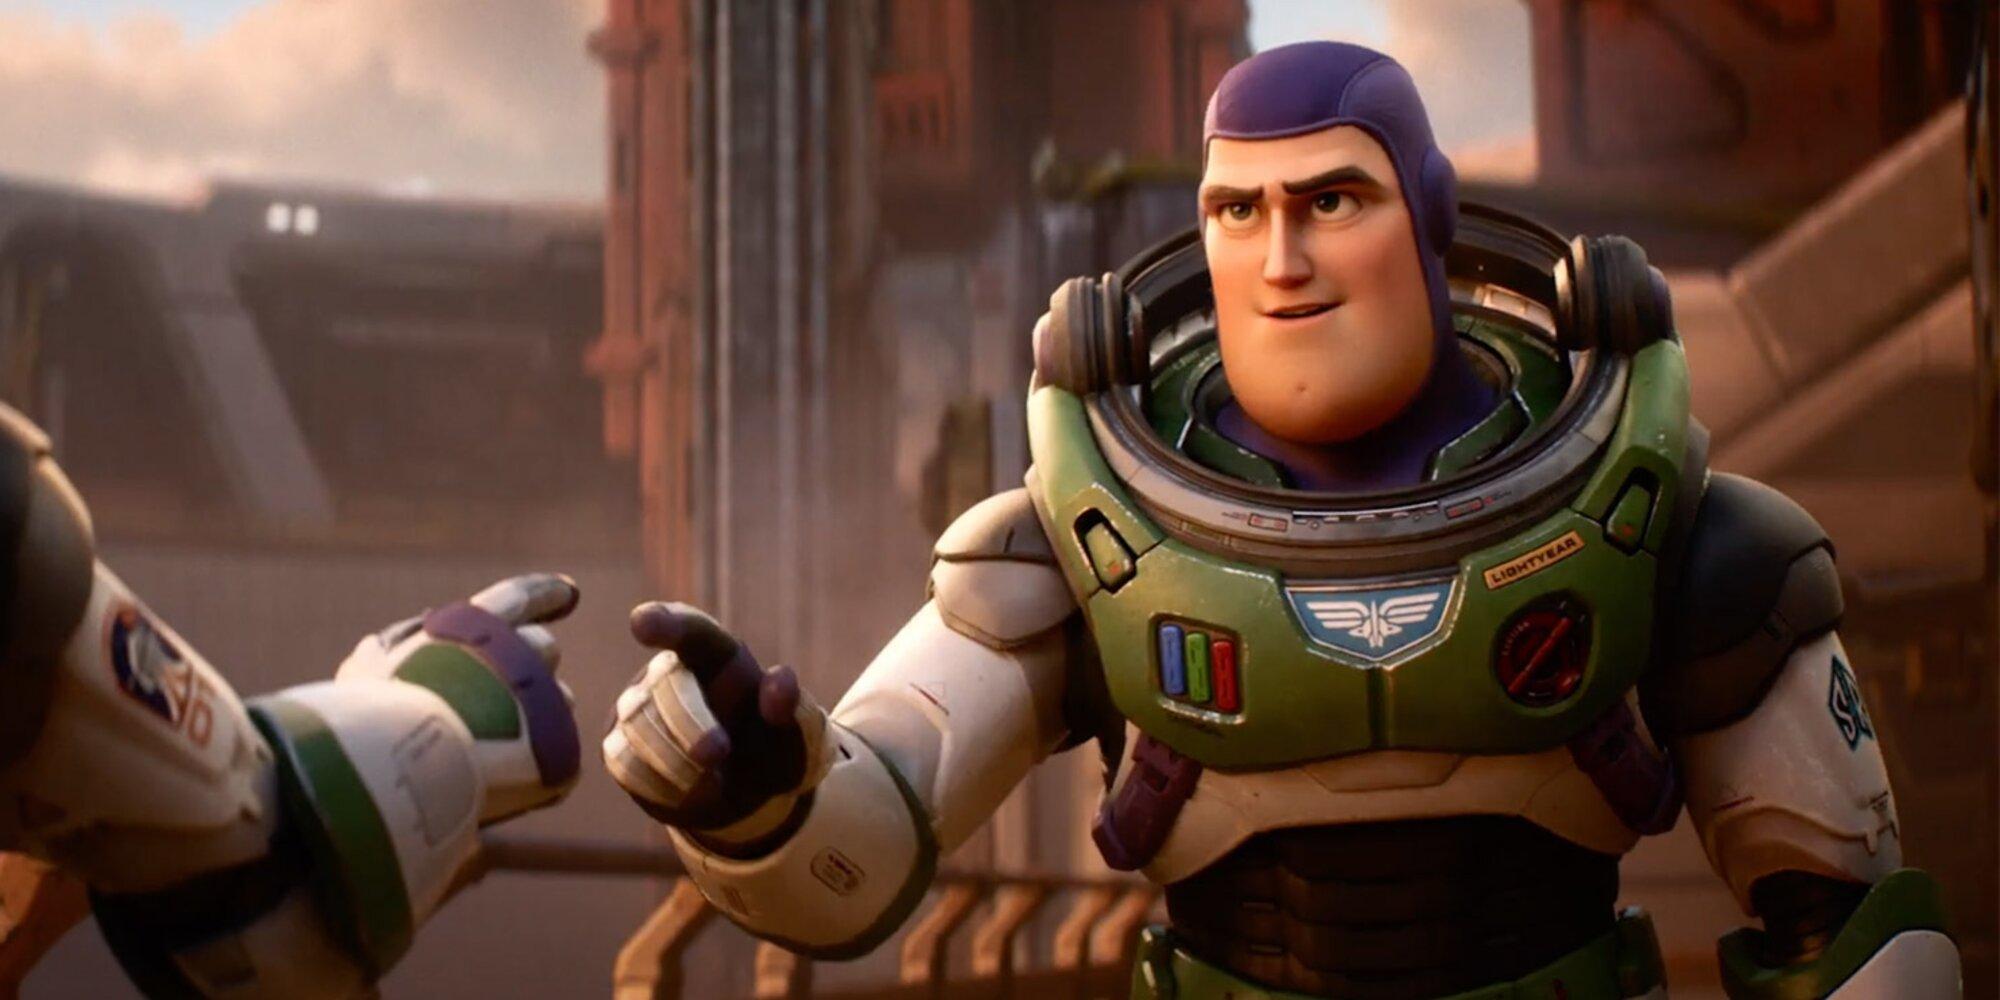 Chris Evans is Buzz Lightyear in Pixar's Lightyear teaser trailer | EW.com